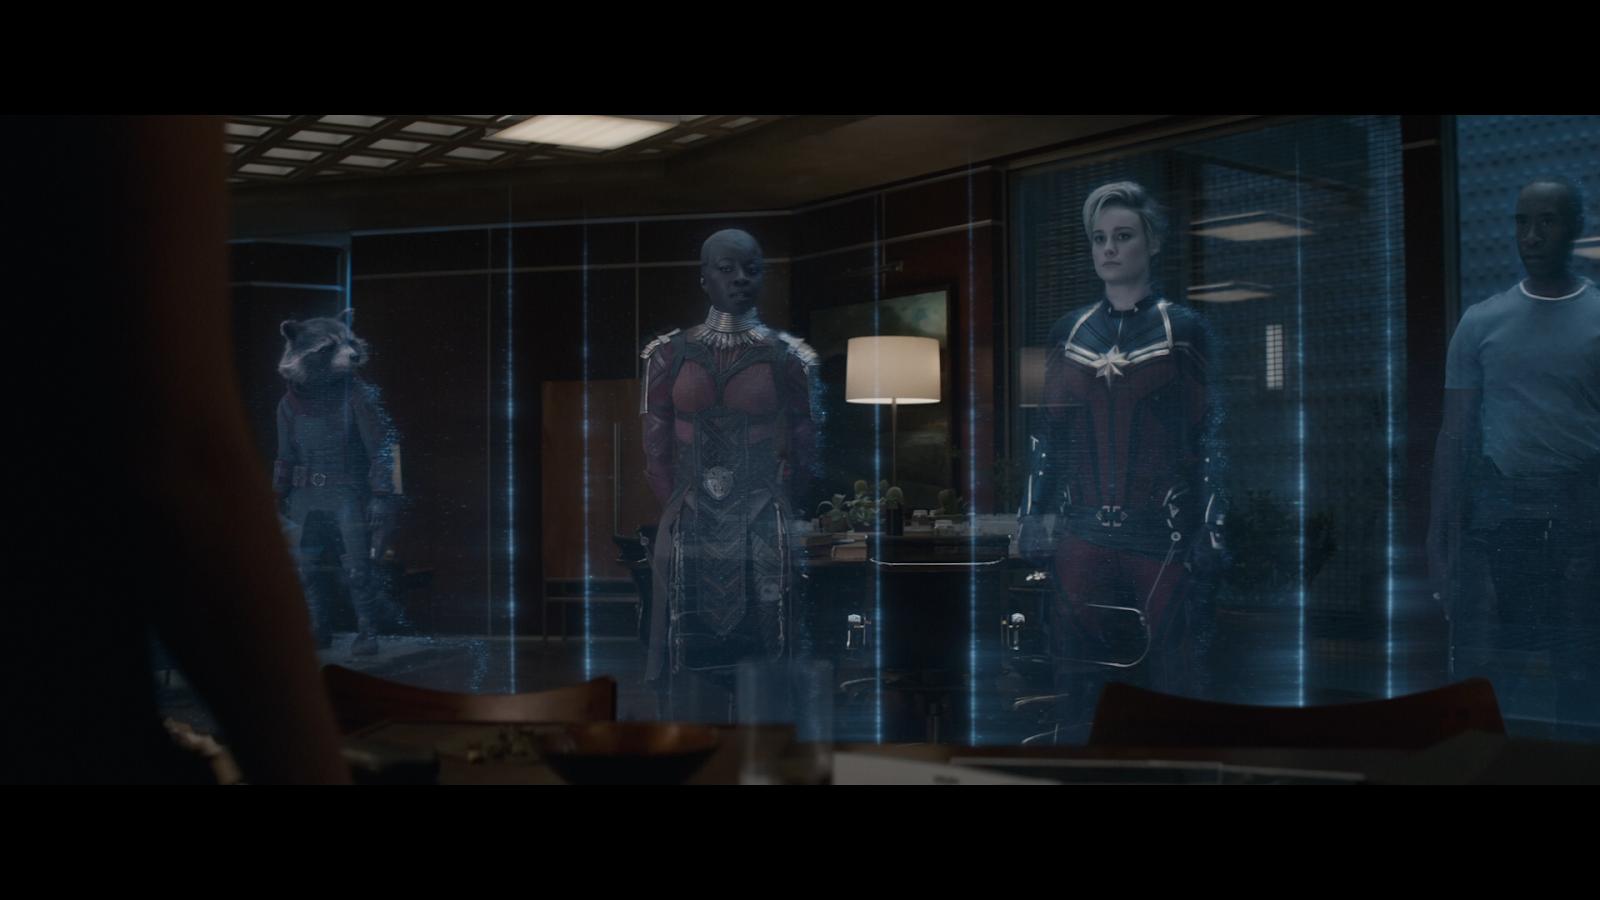 Avengers Endgame (2019) Full HD 1080p BD25 LATINO 2